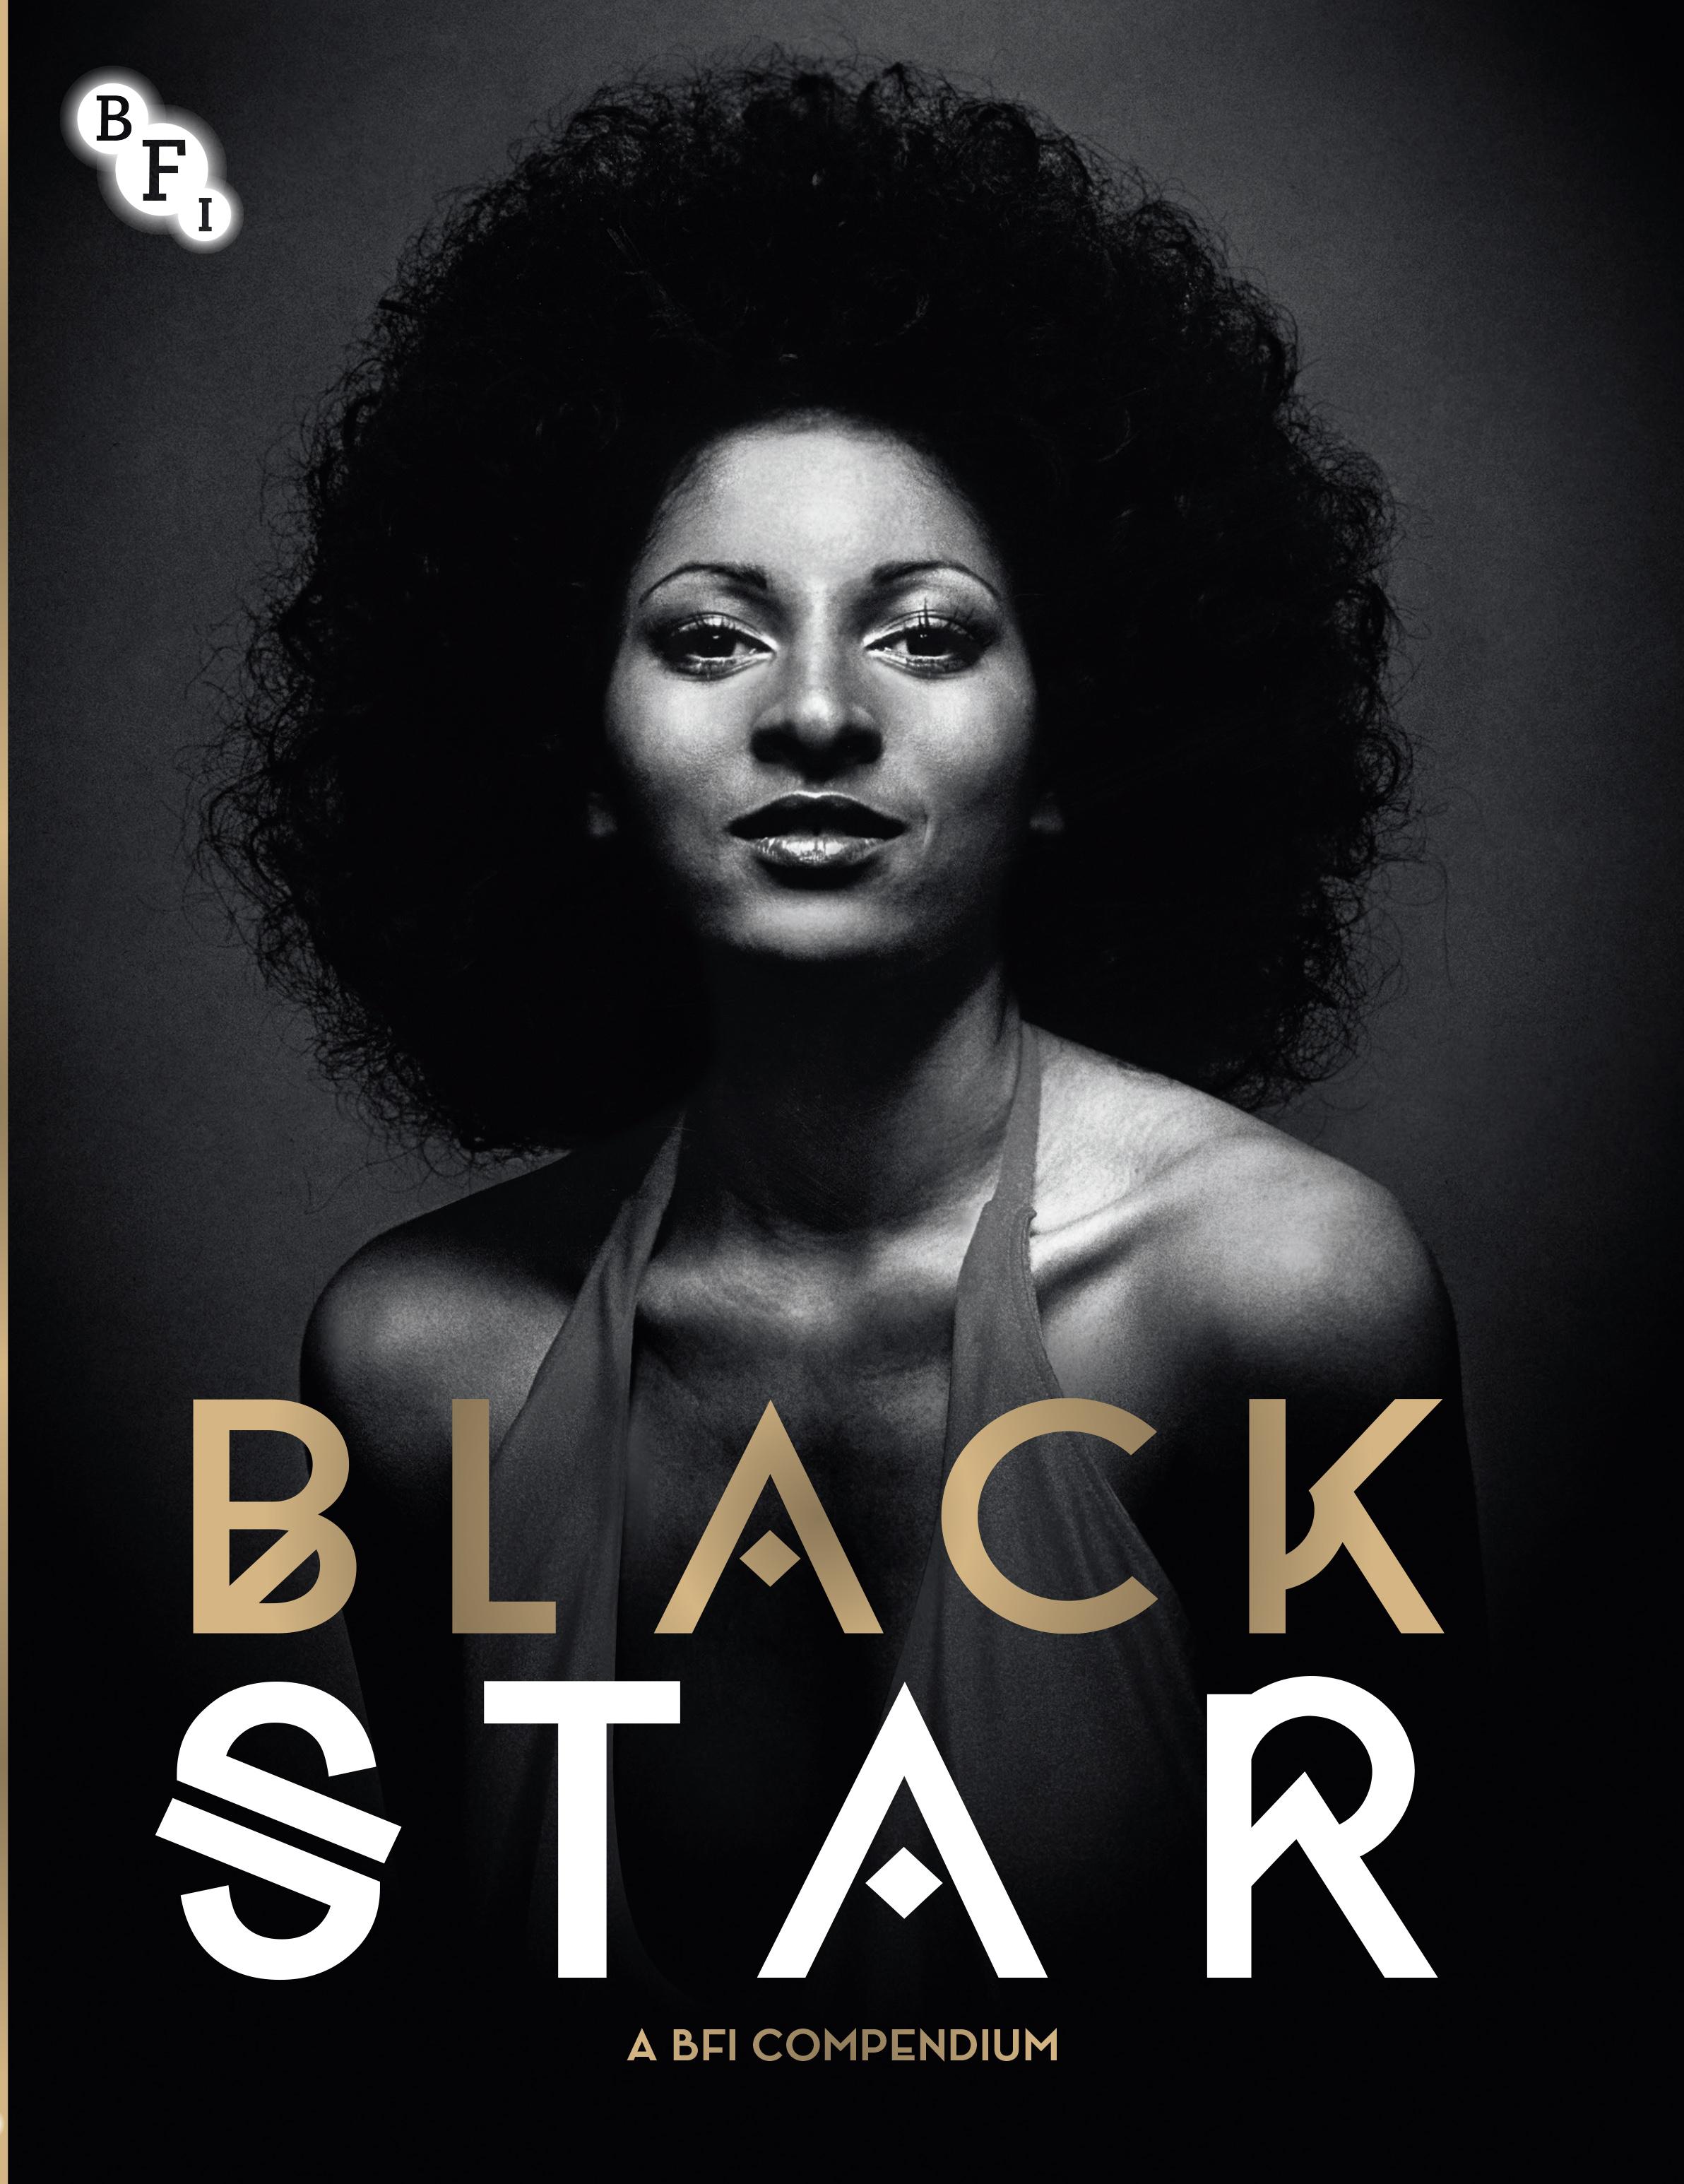 buy black star a bfi compendium shop. Black Bedroom Furniture Sets. Home Design Ideas